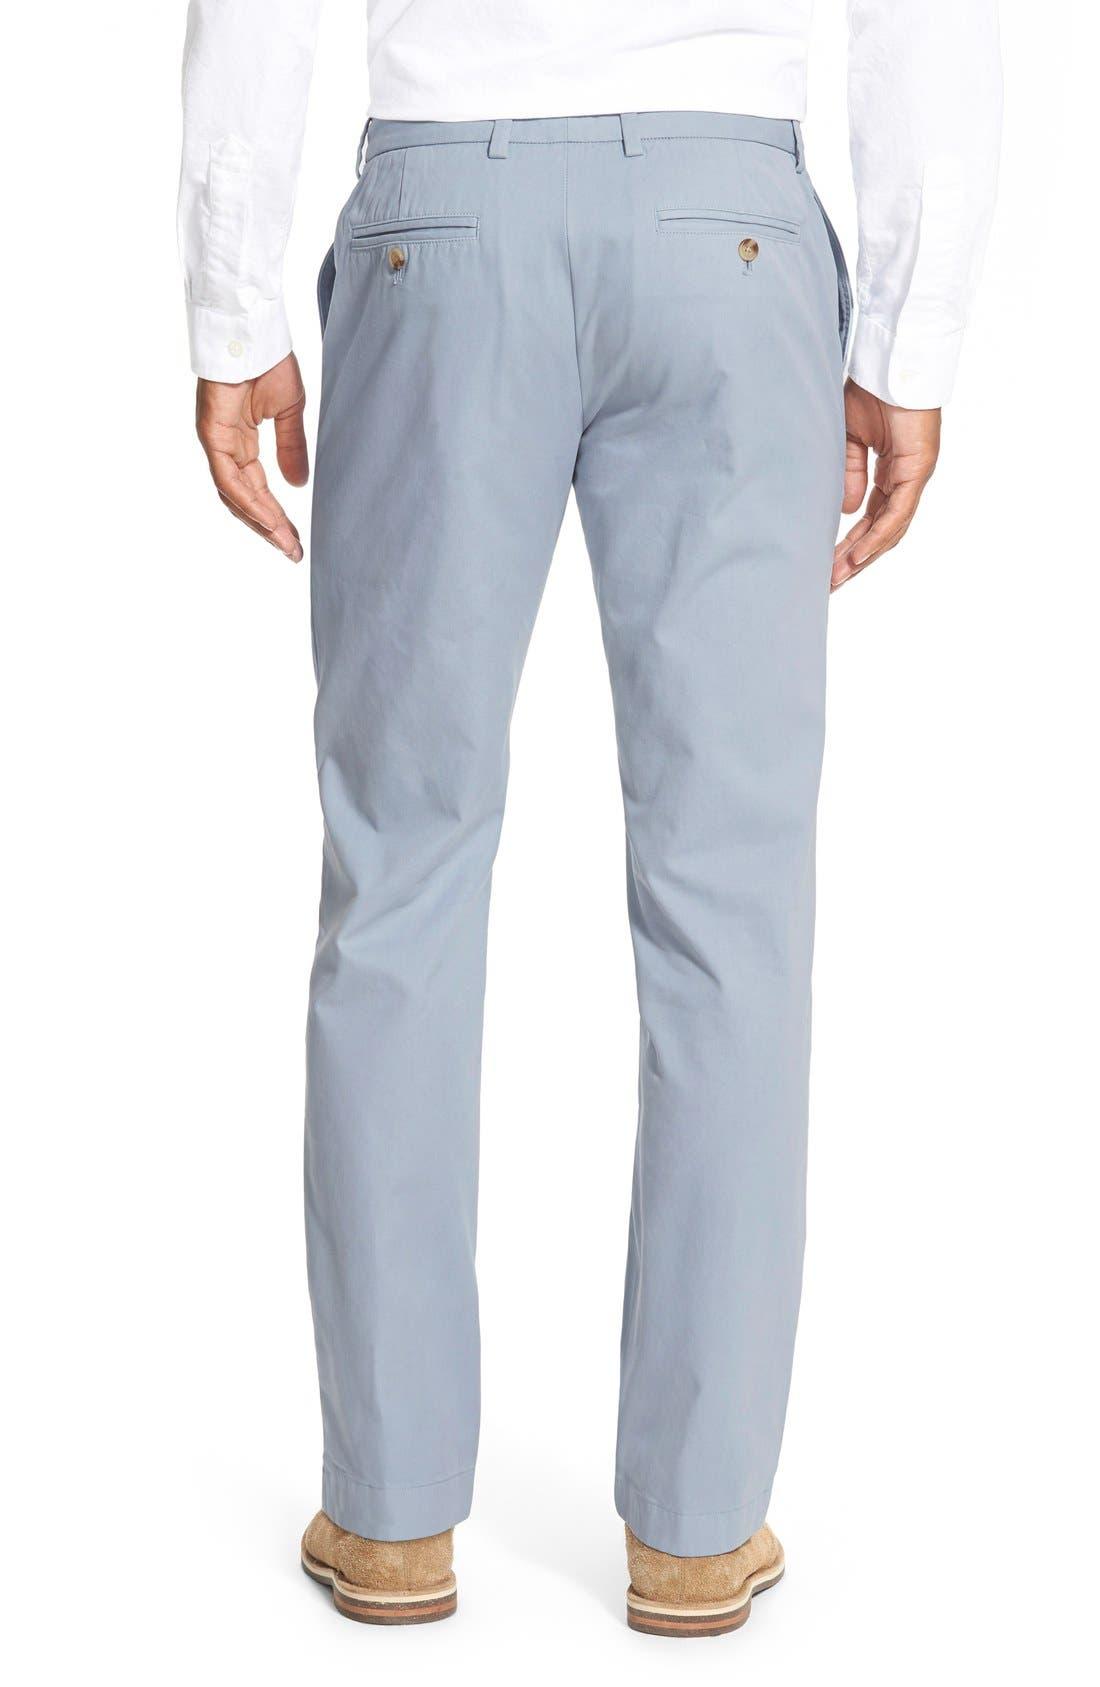 'Breaker' Slim Fit Pants,                             Alternate thumbnail 2, color,                             023